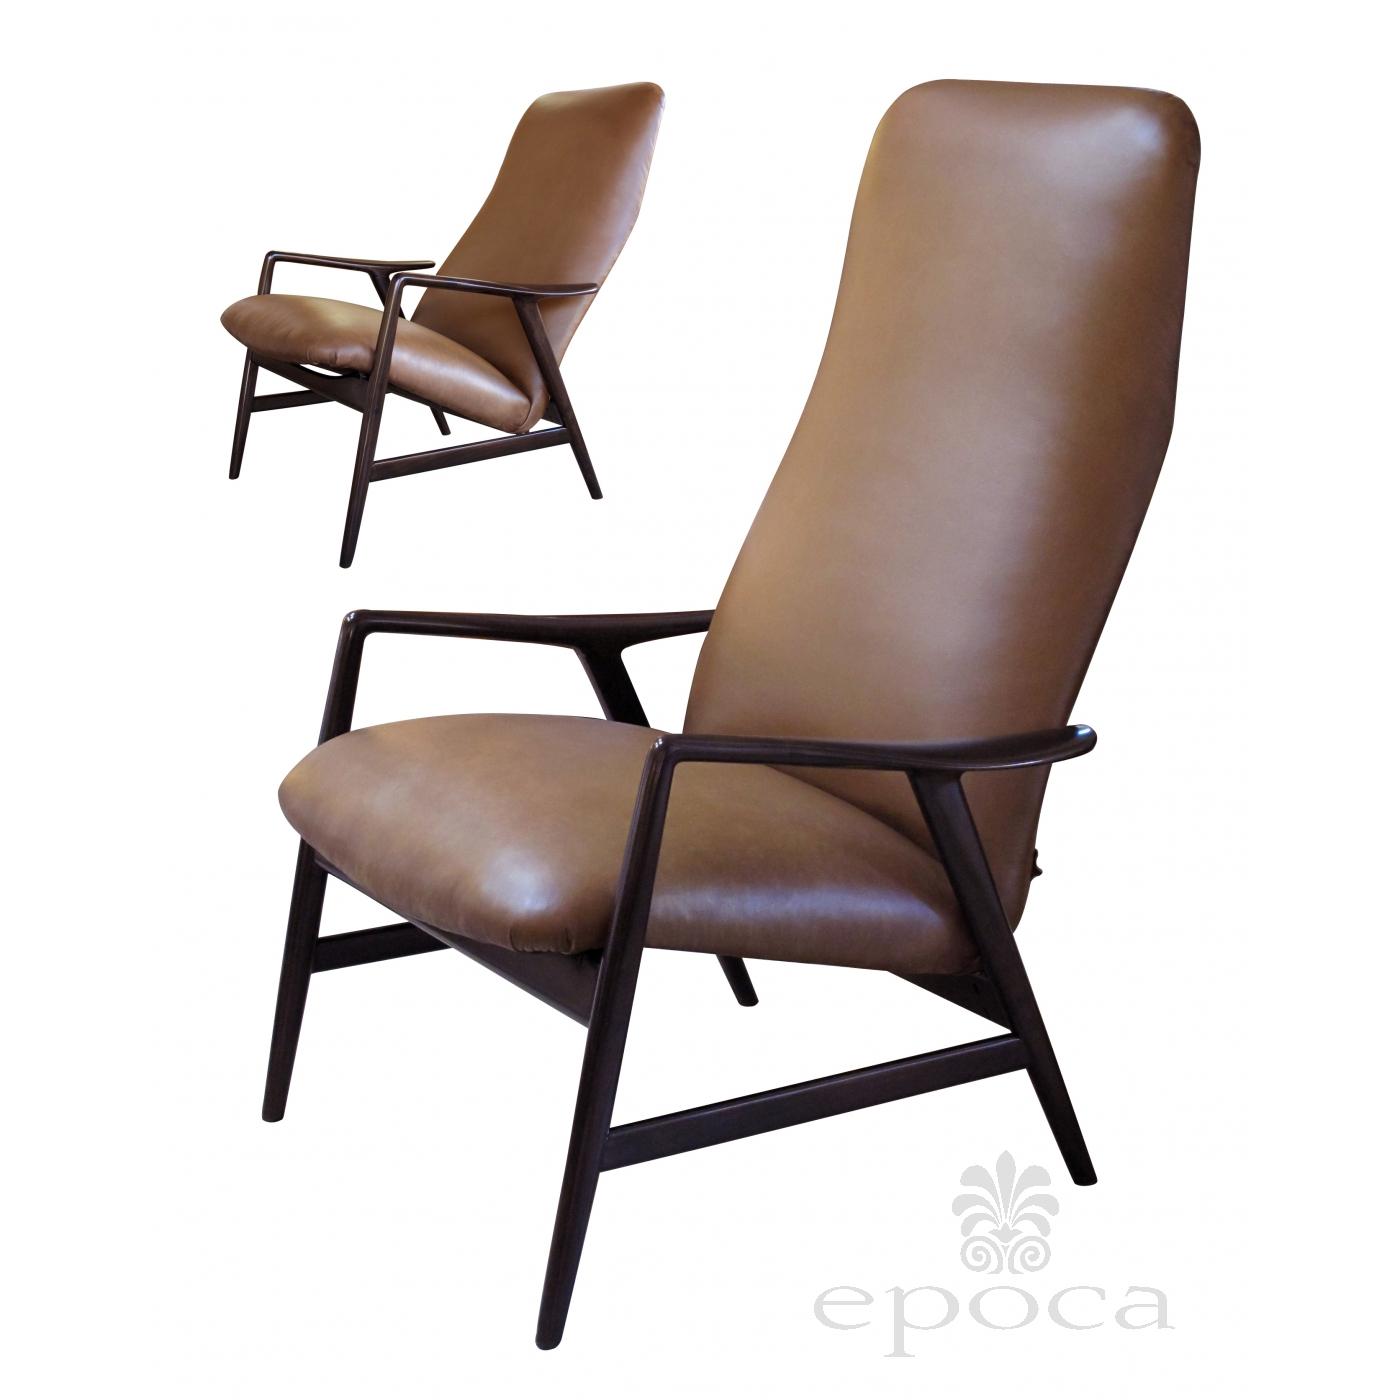 correct posture lounge chair stool black gold a stylish danish modern alf svensson for fritz hansen 1960